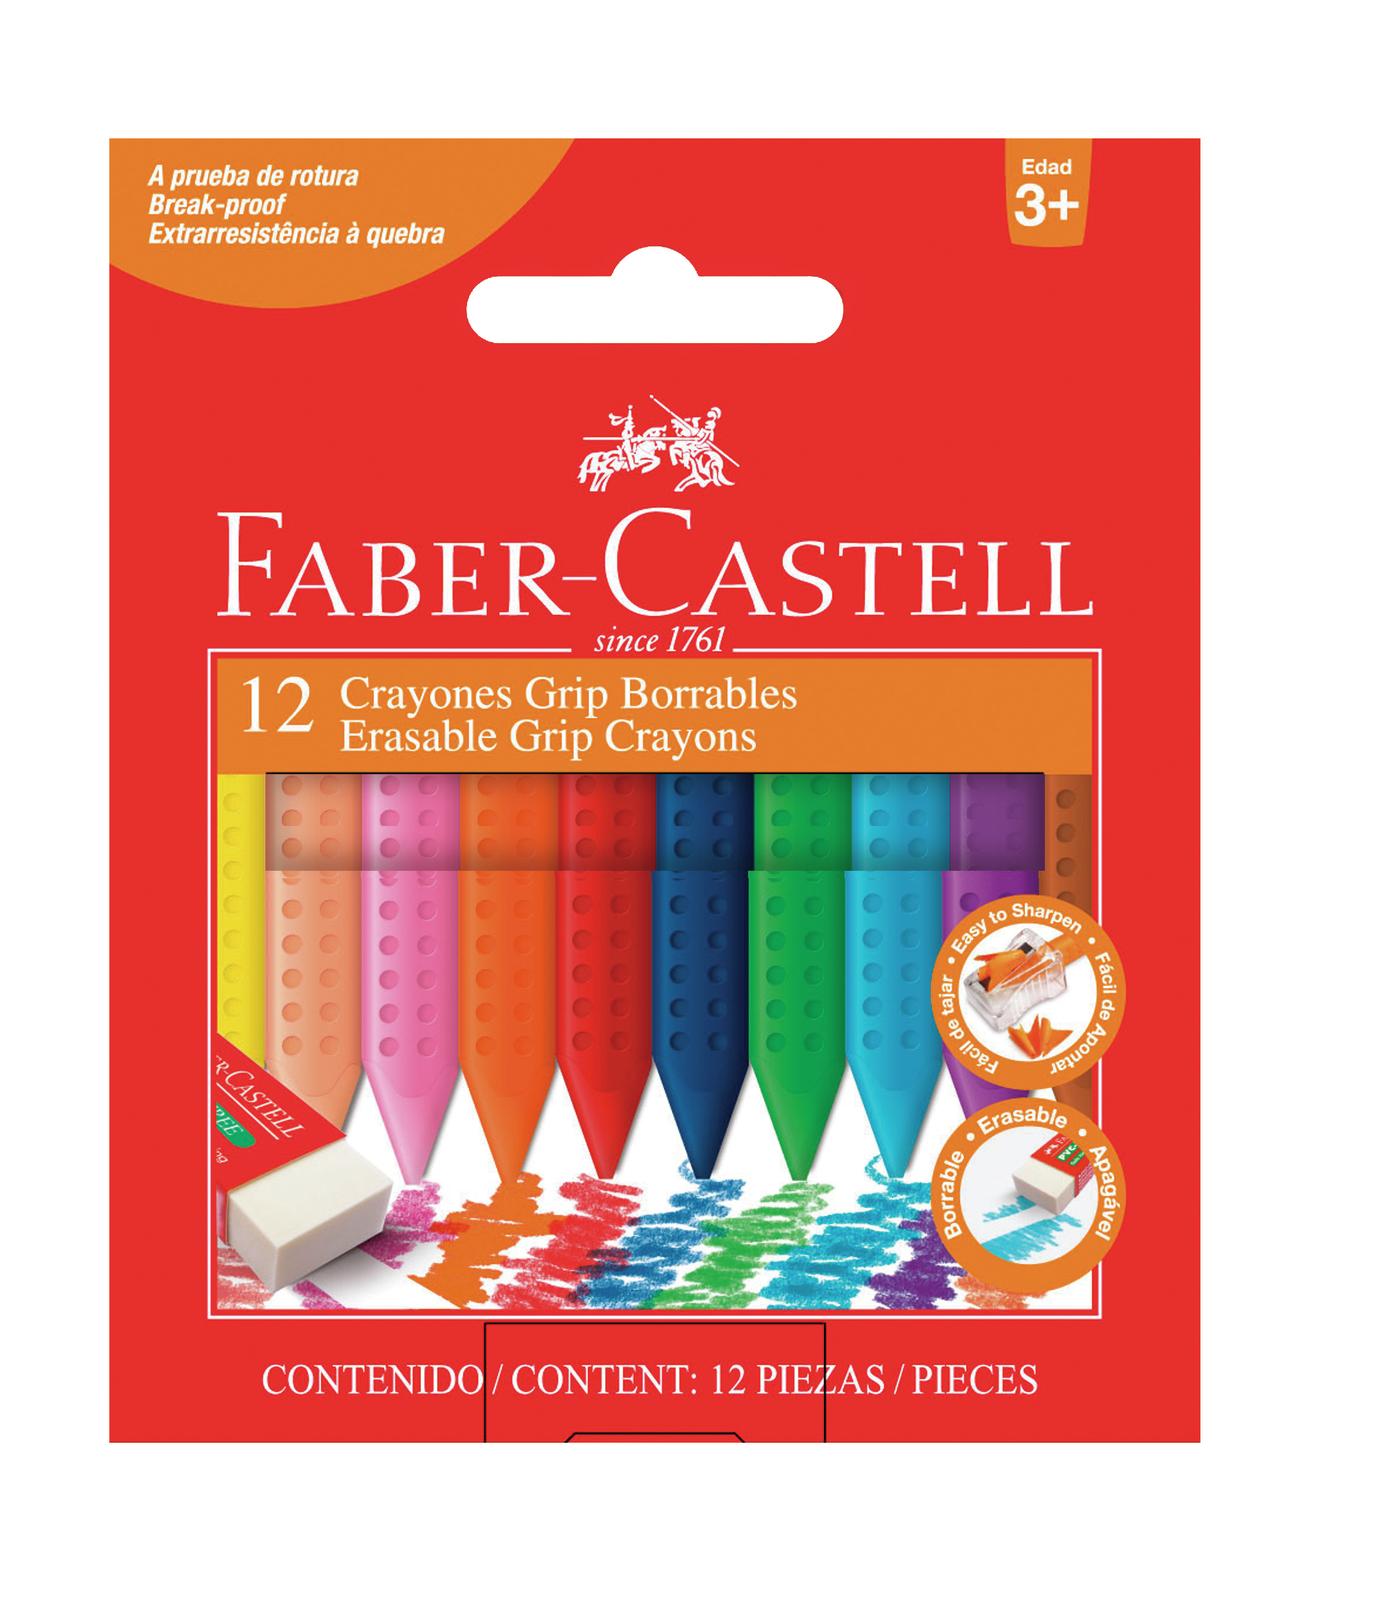 Faber-Castell: Jumbo Grip Crayons - Box 12 image